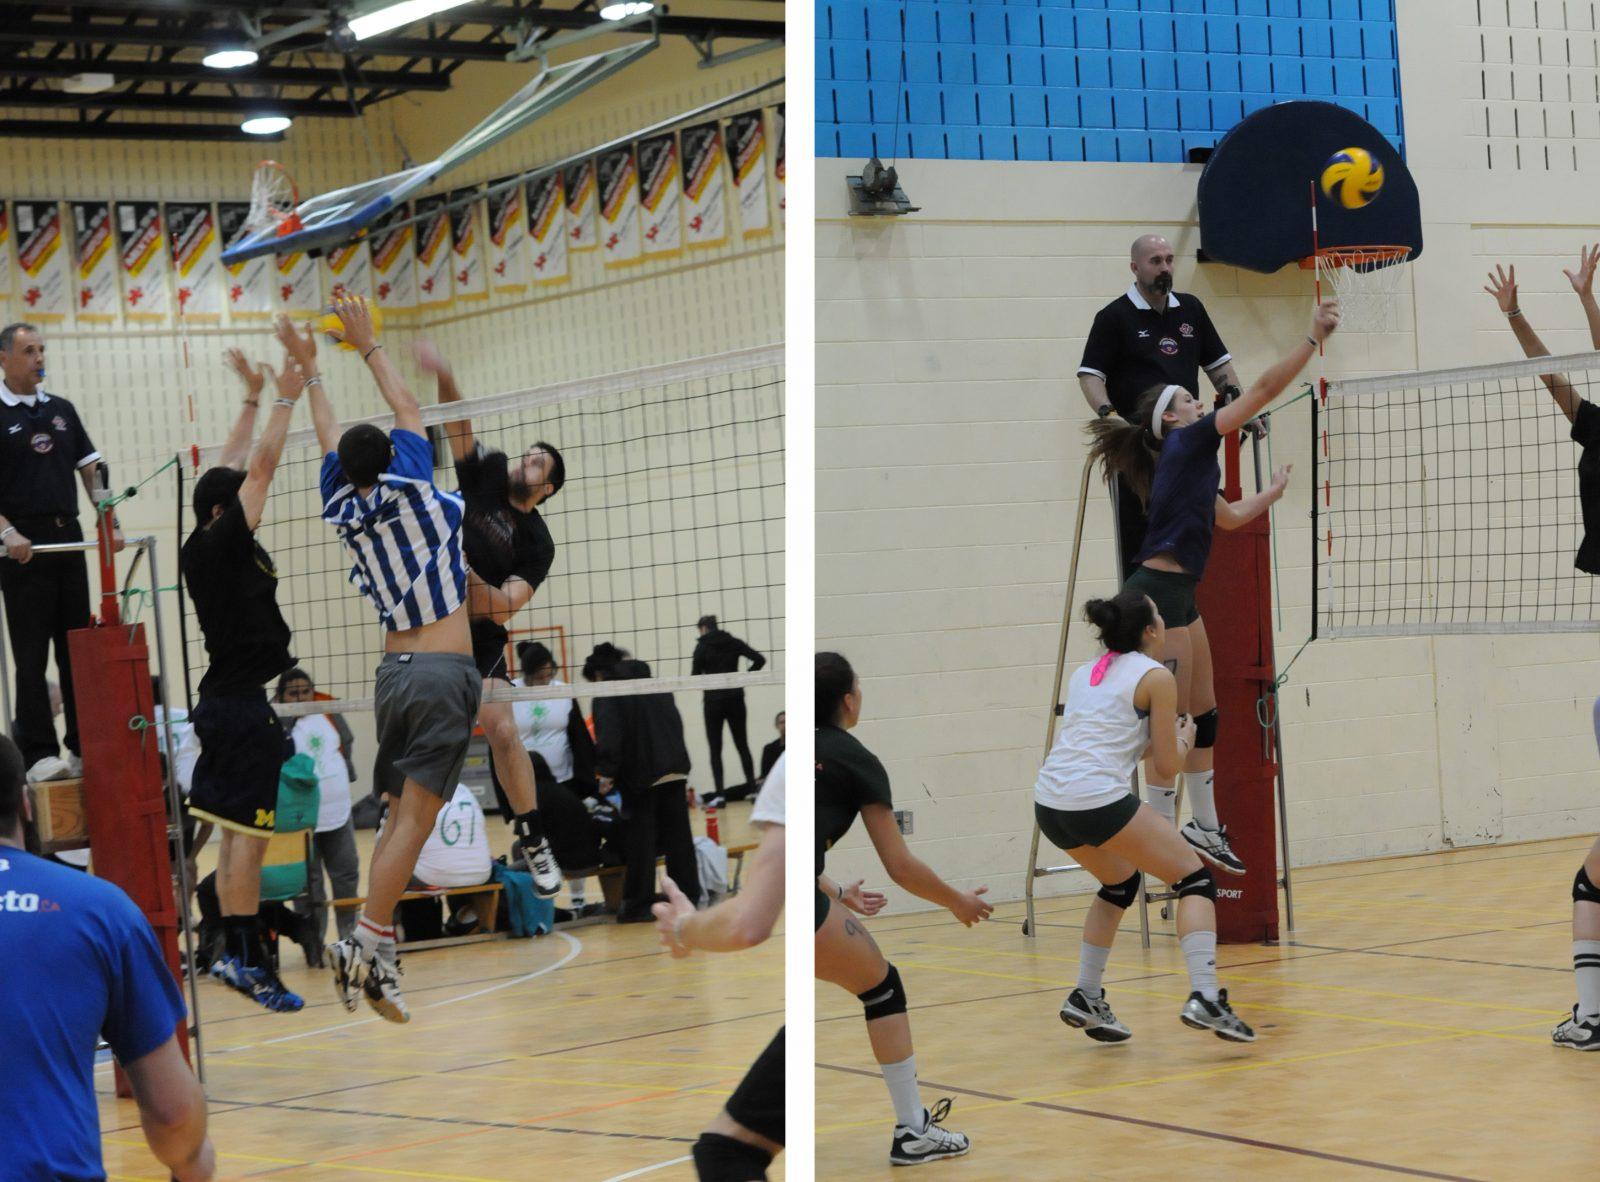 Tournoi de volleyball Orange Alouette : Sept-Îles, ça commence aujourd'hui!